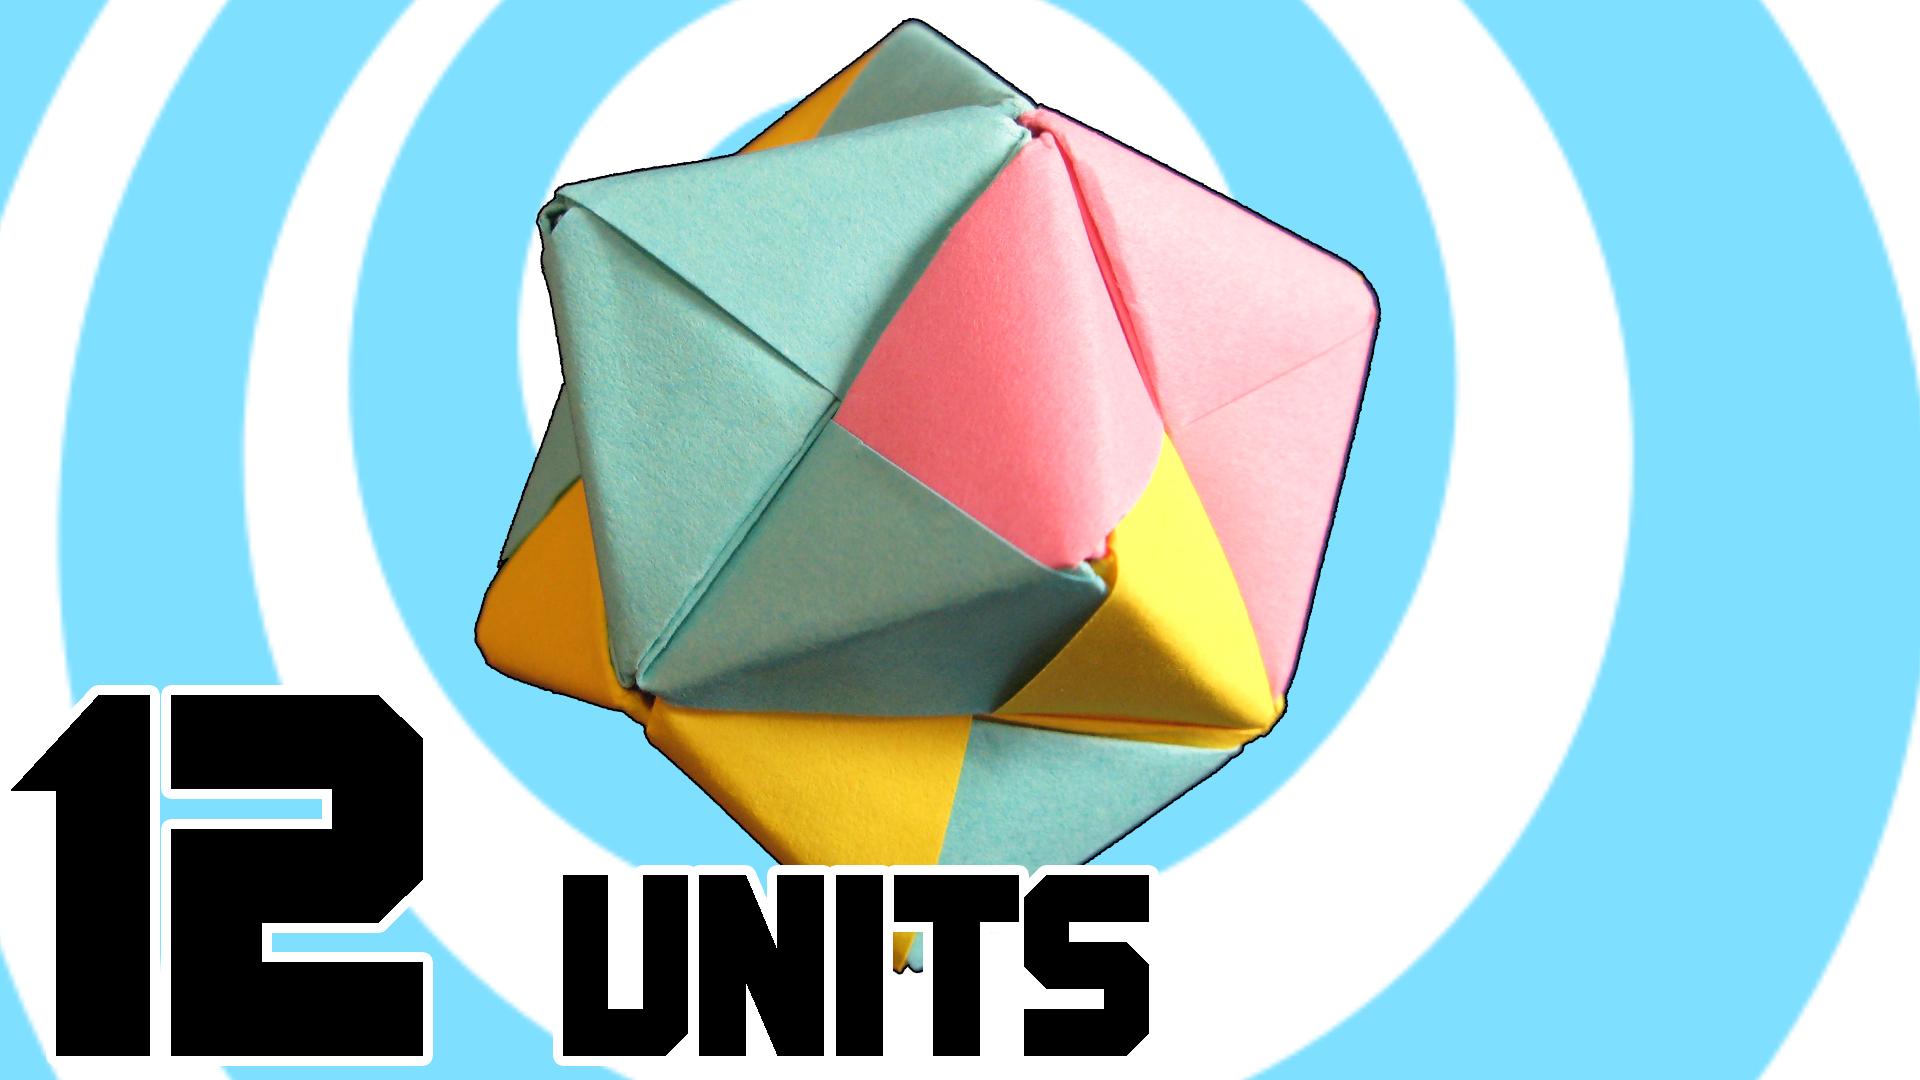 Modular Origami Octahedron with 12 Sonobe Units